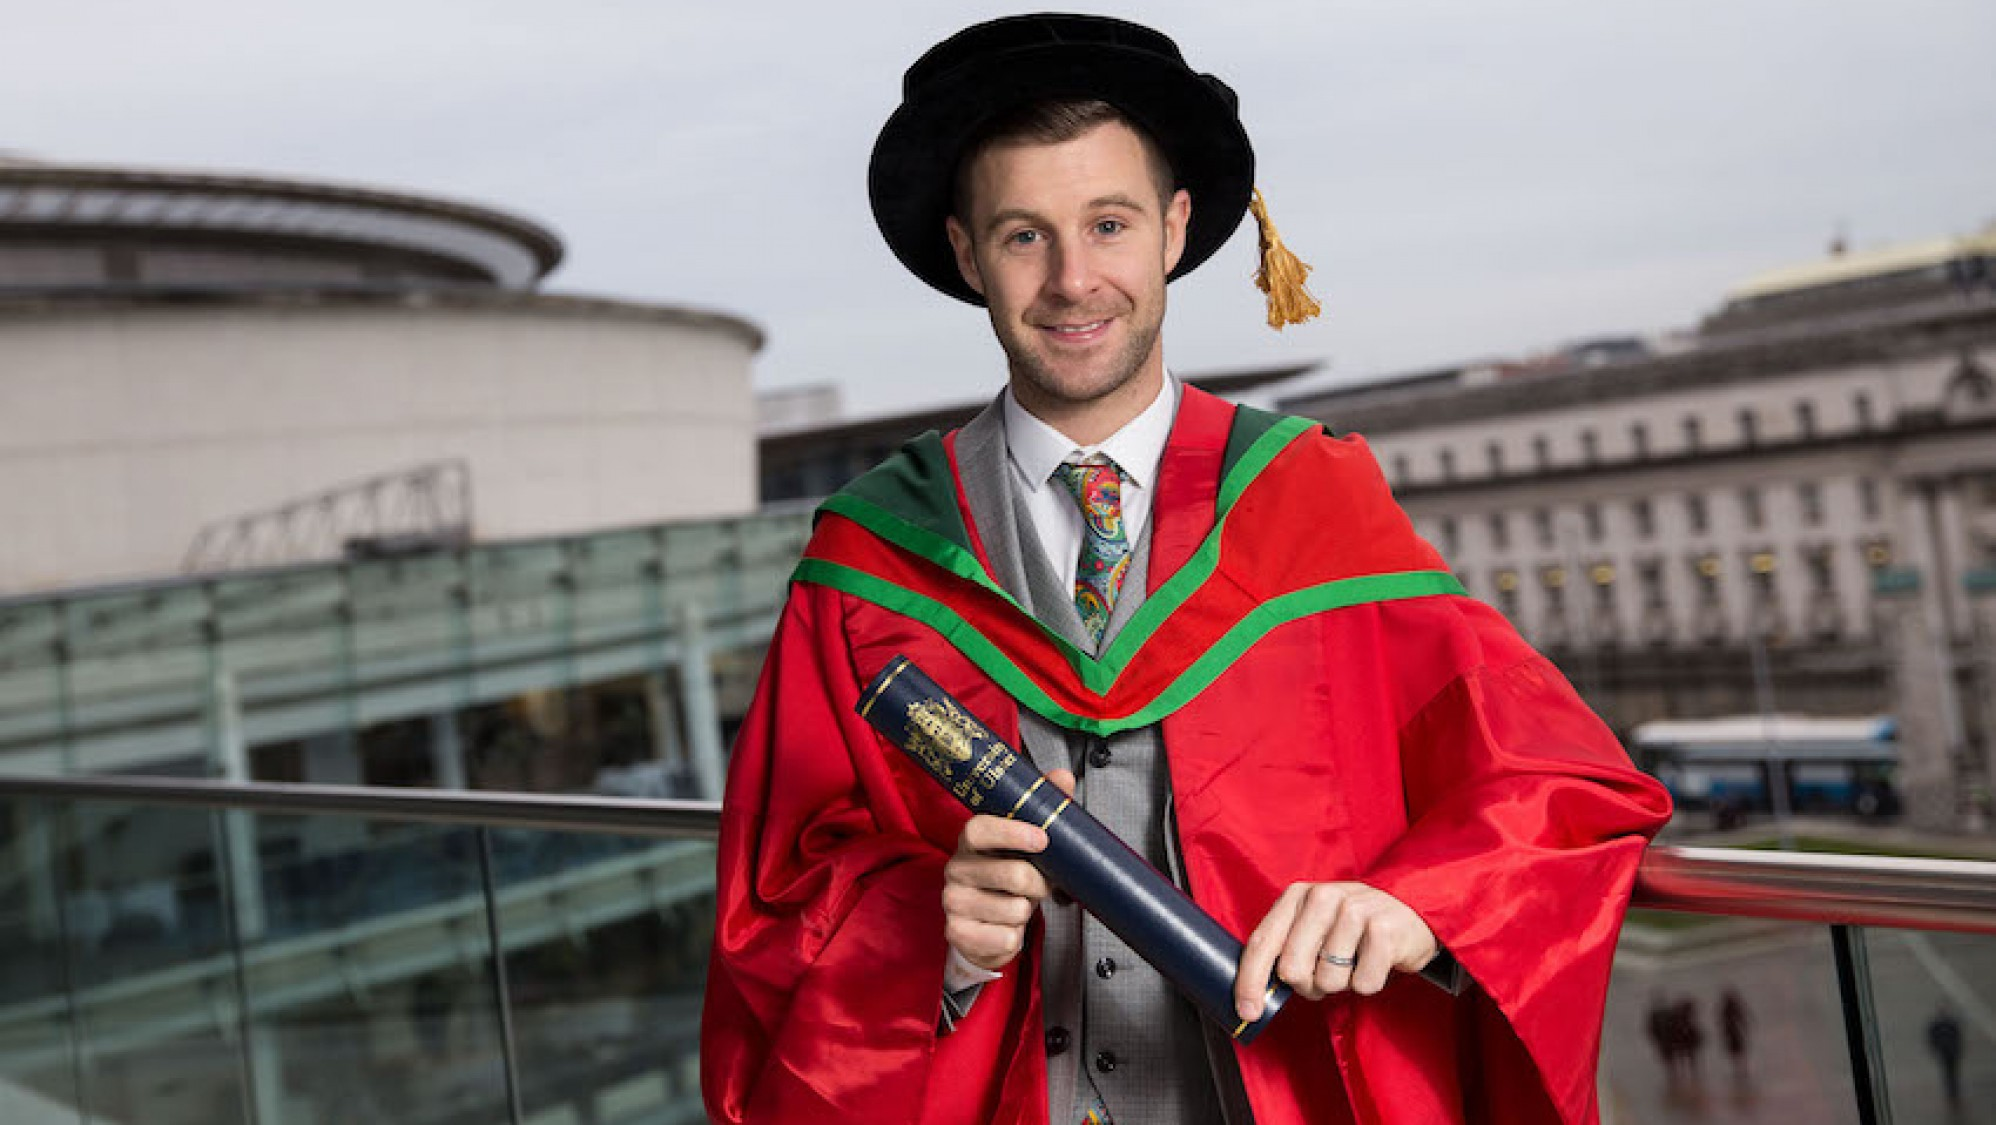 Jonathan Rea homenageado pelo Universidade do Ulster